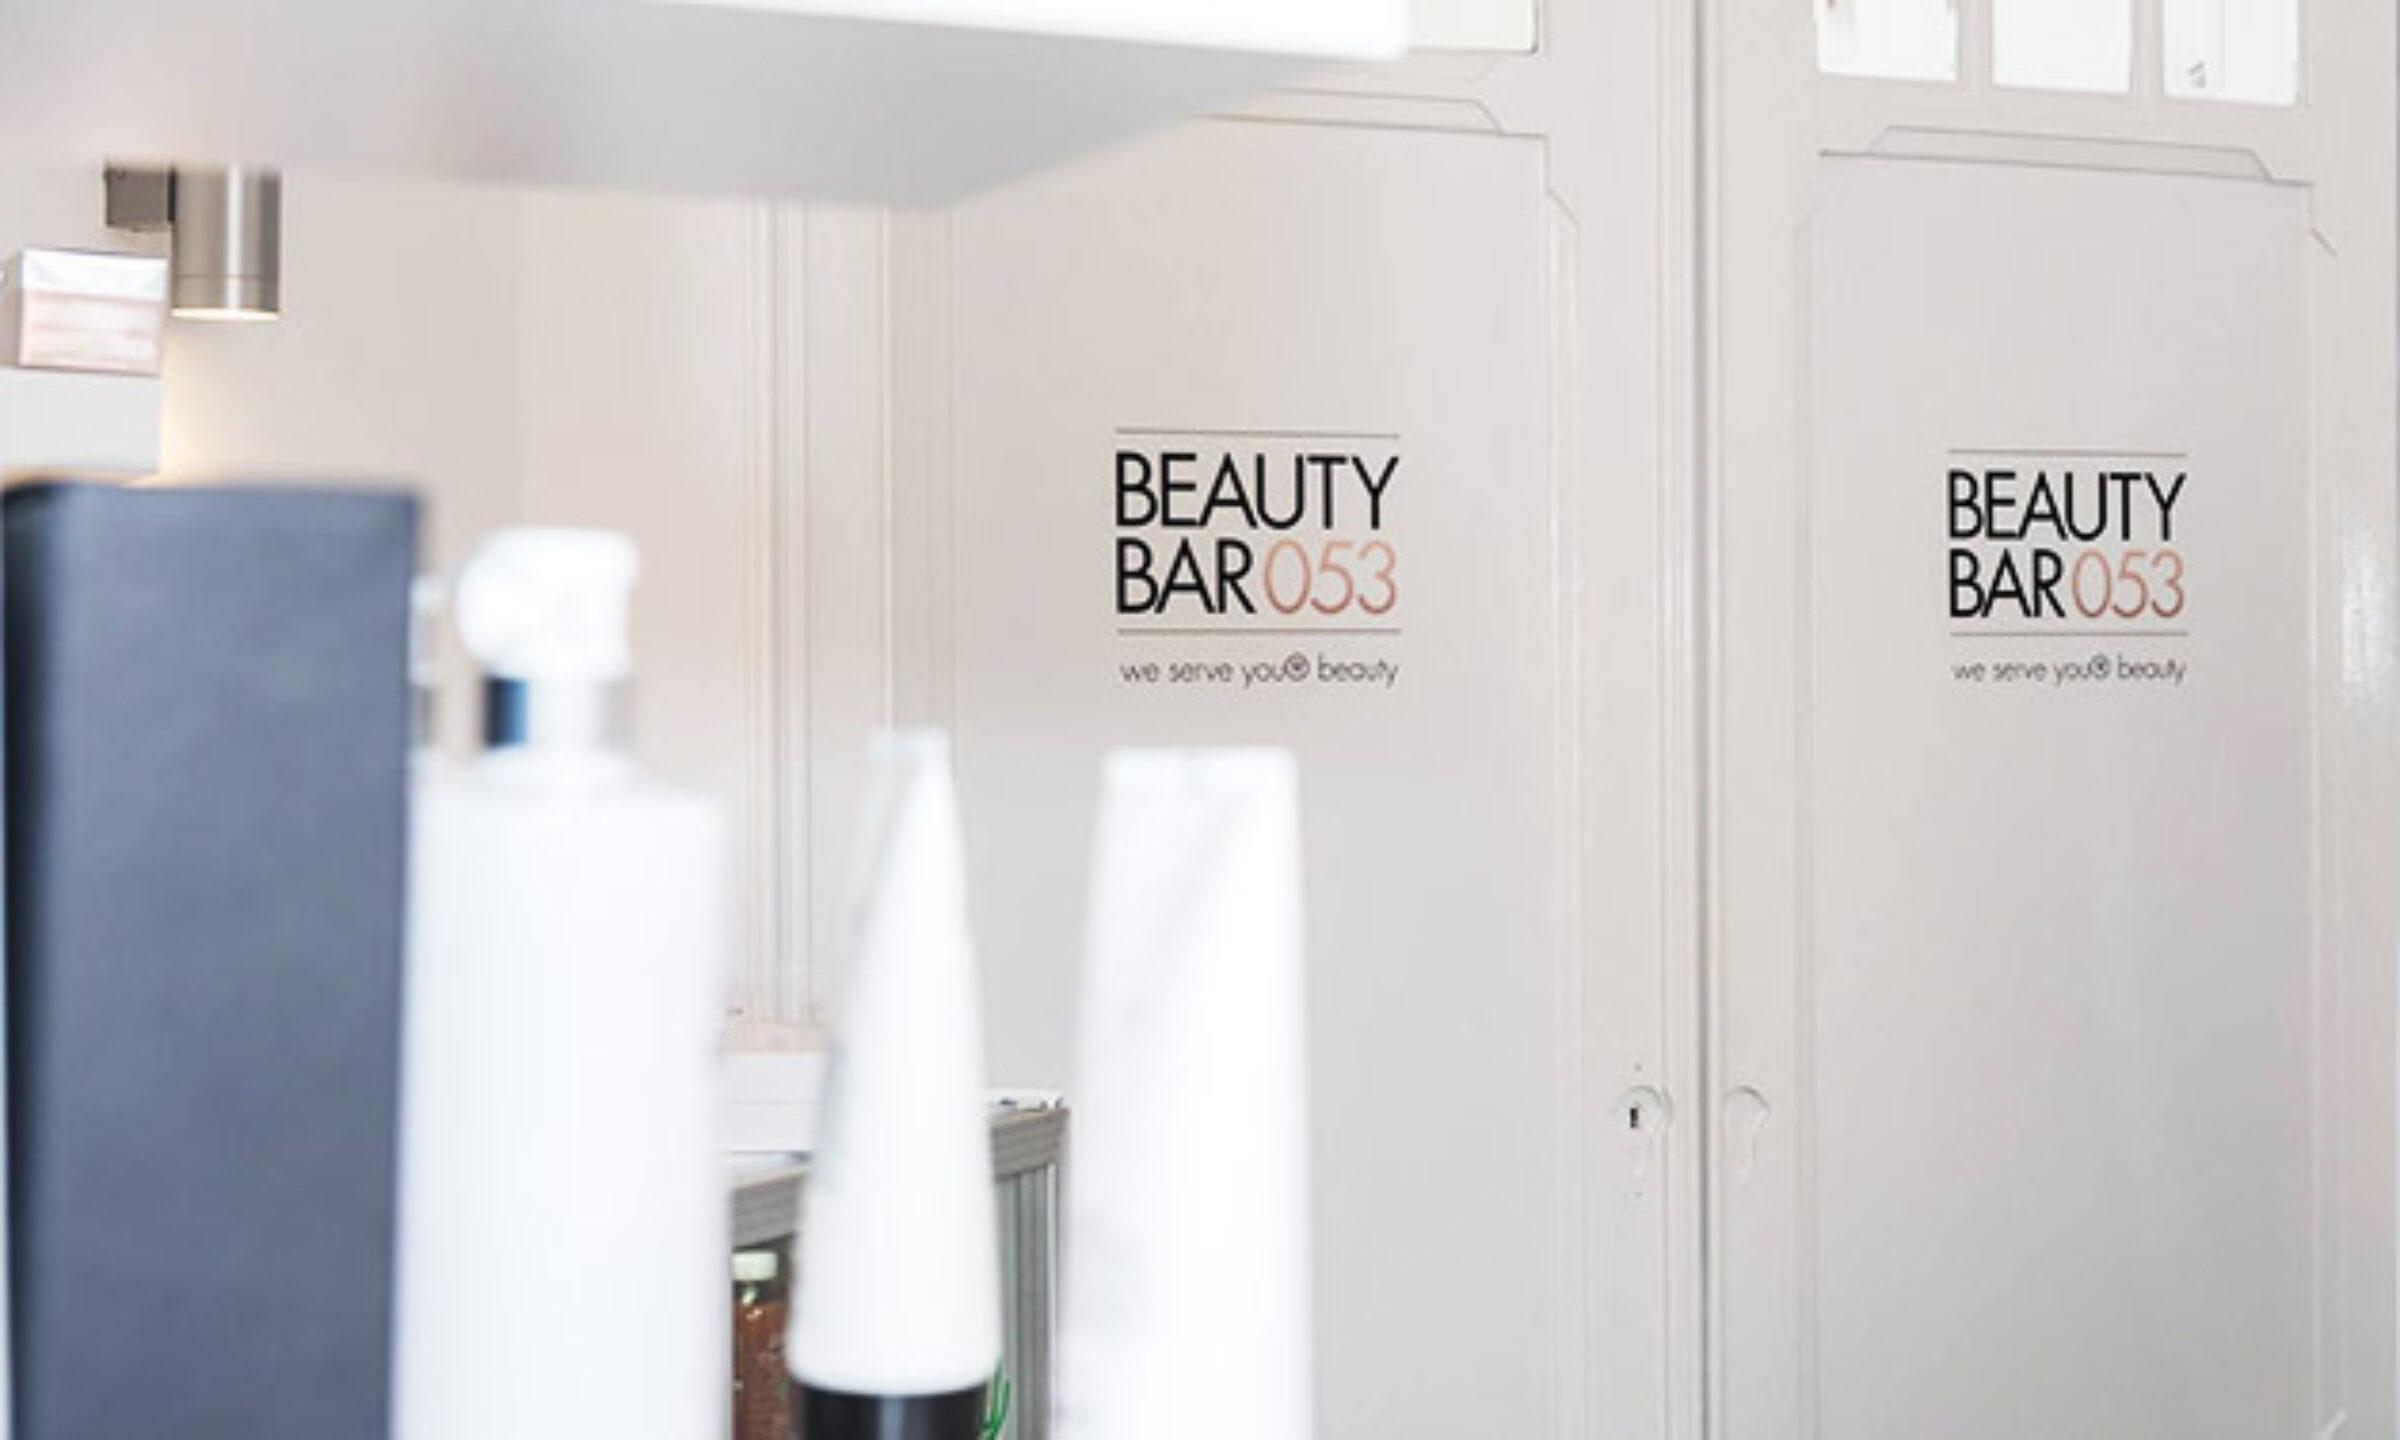 Beauty bar 053 enschede1